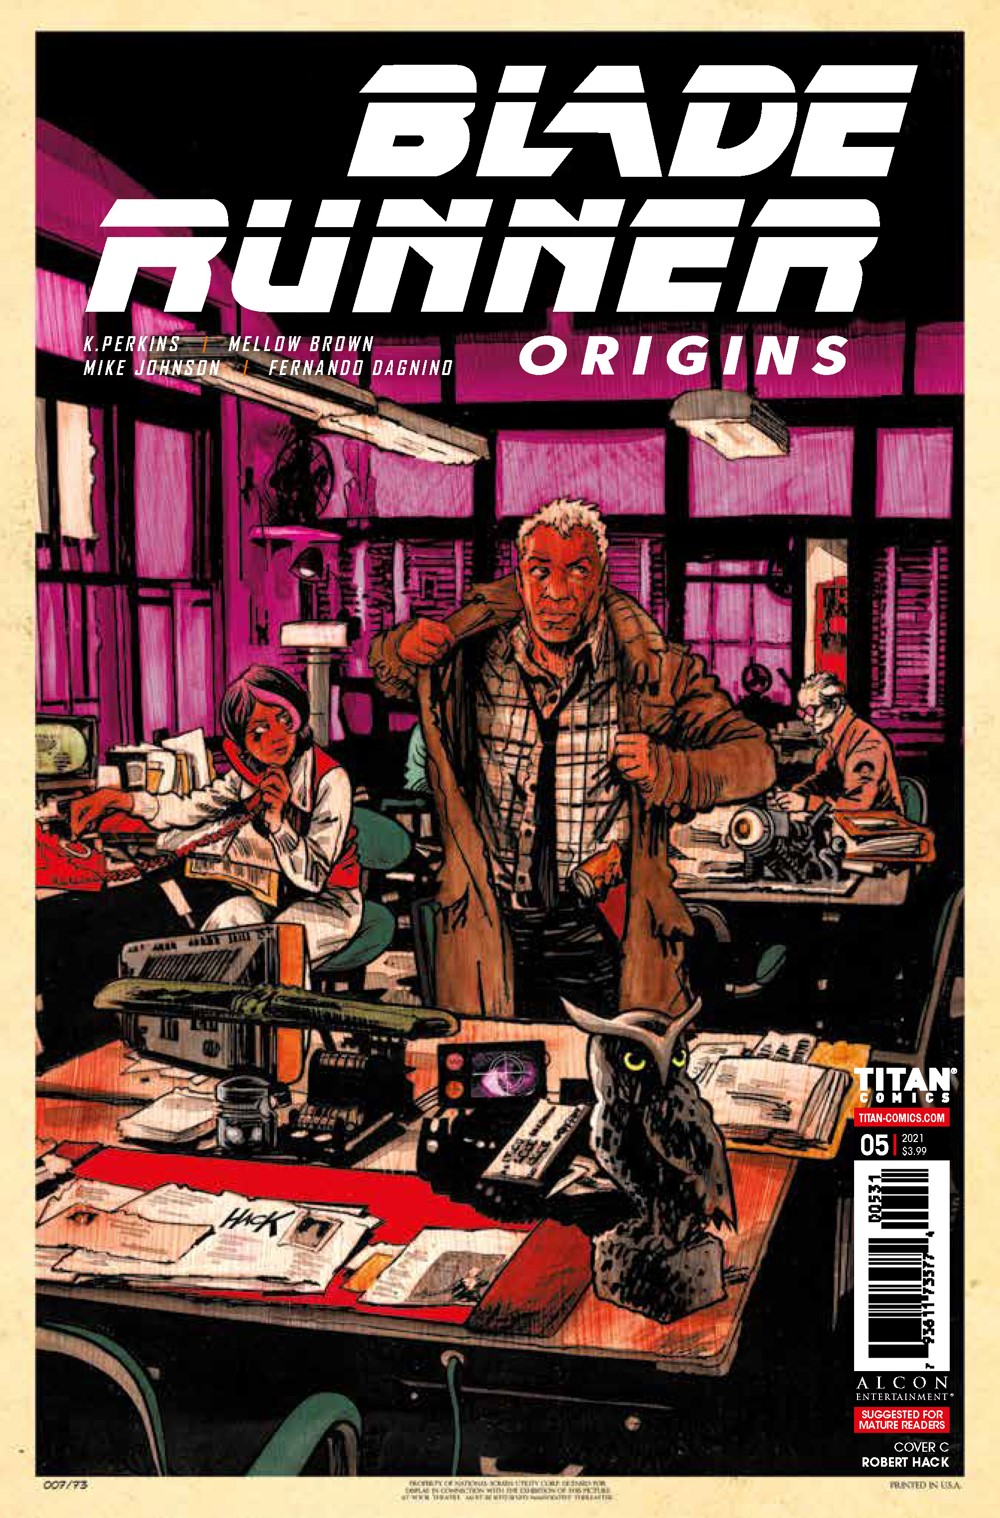 Blade_Runner_Origins_5_COVERS_C ComicList Previews: BLADE RUNNER ORIGINS #5